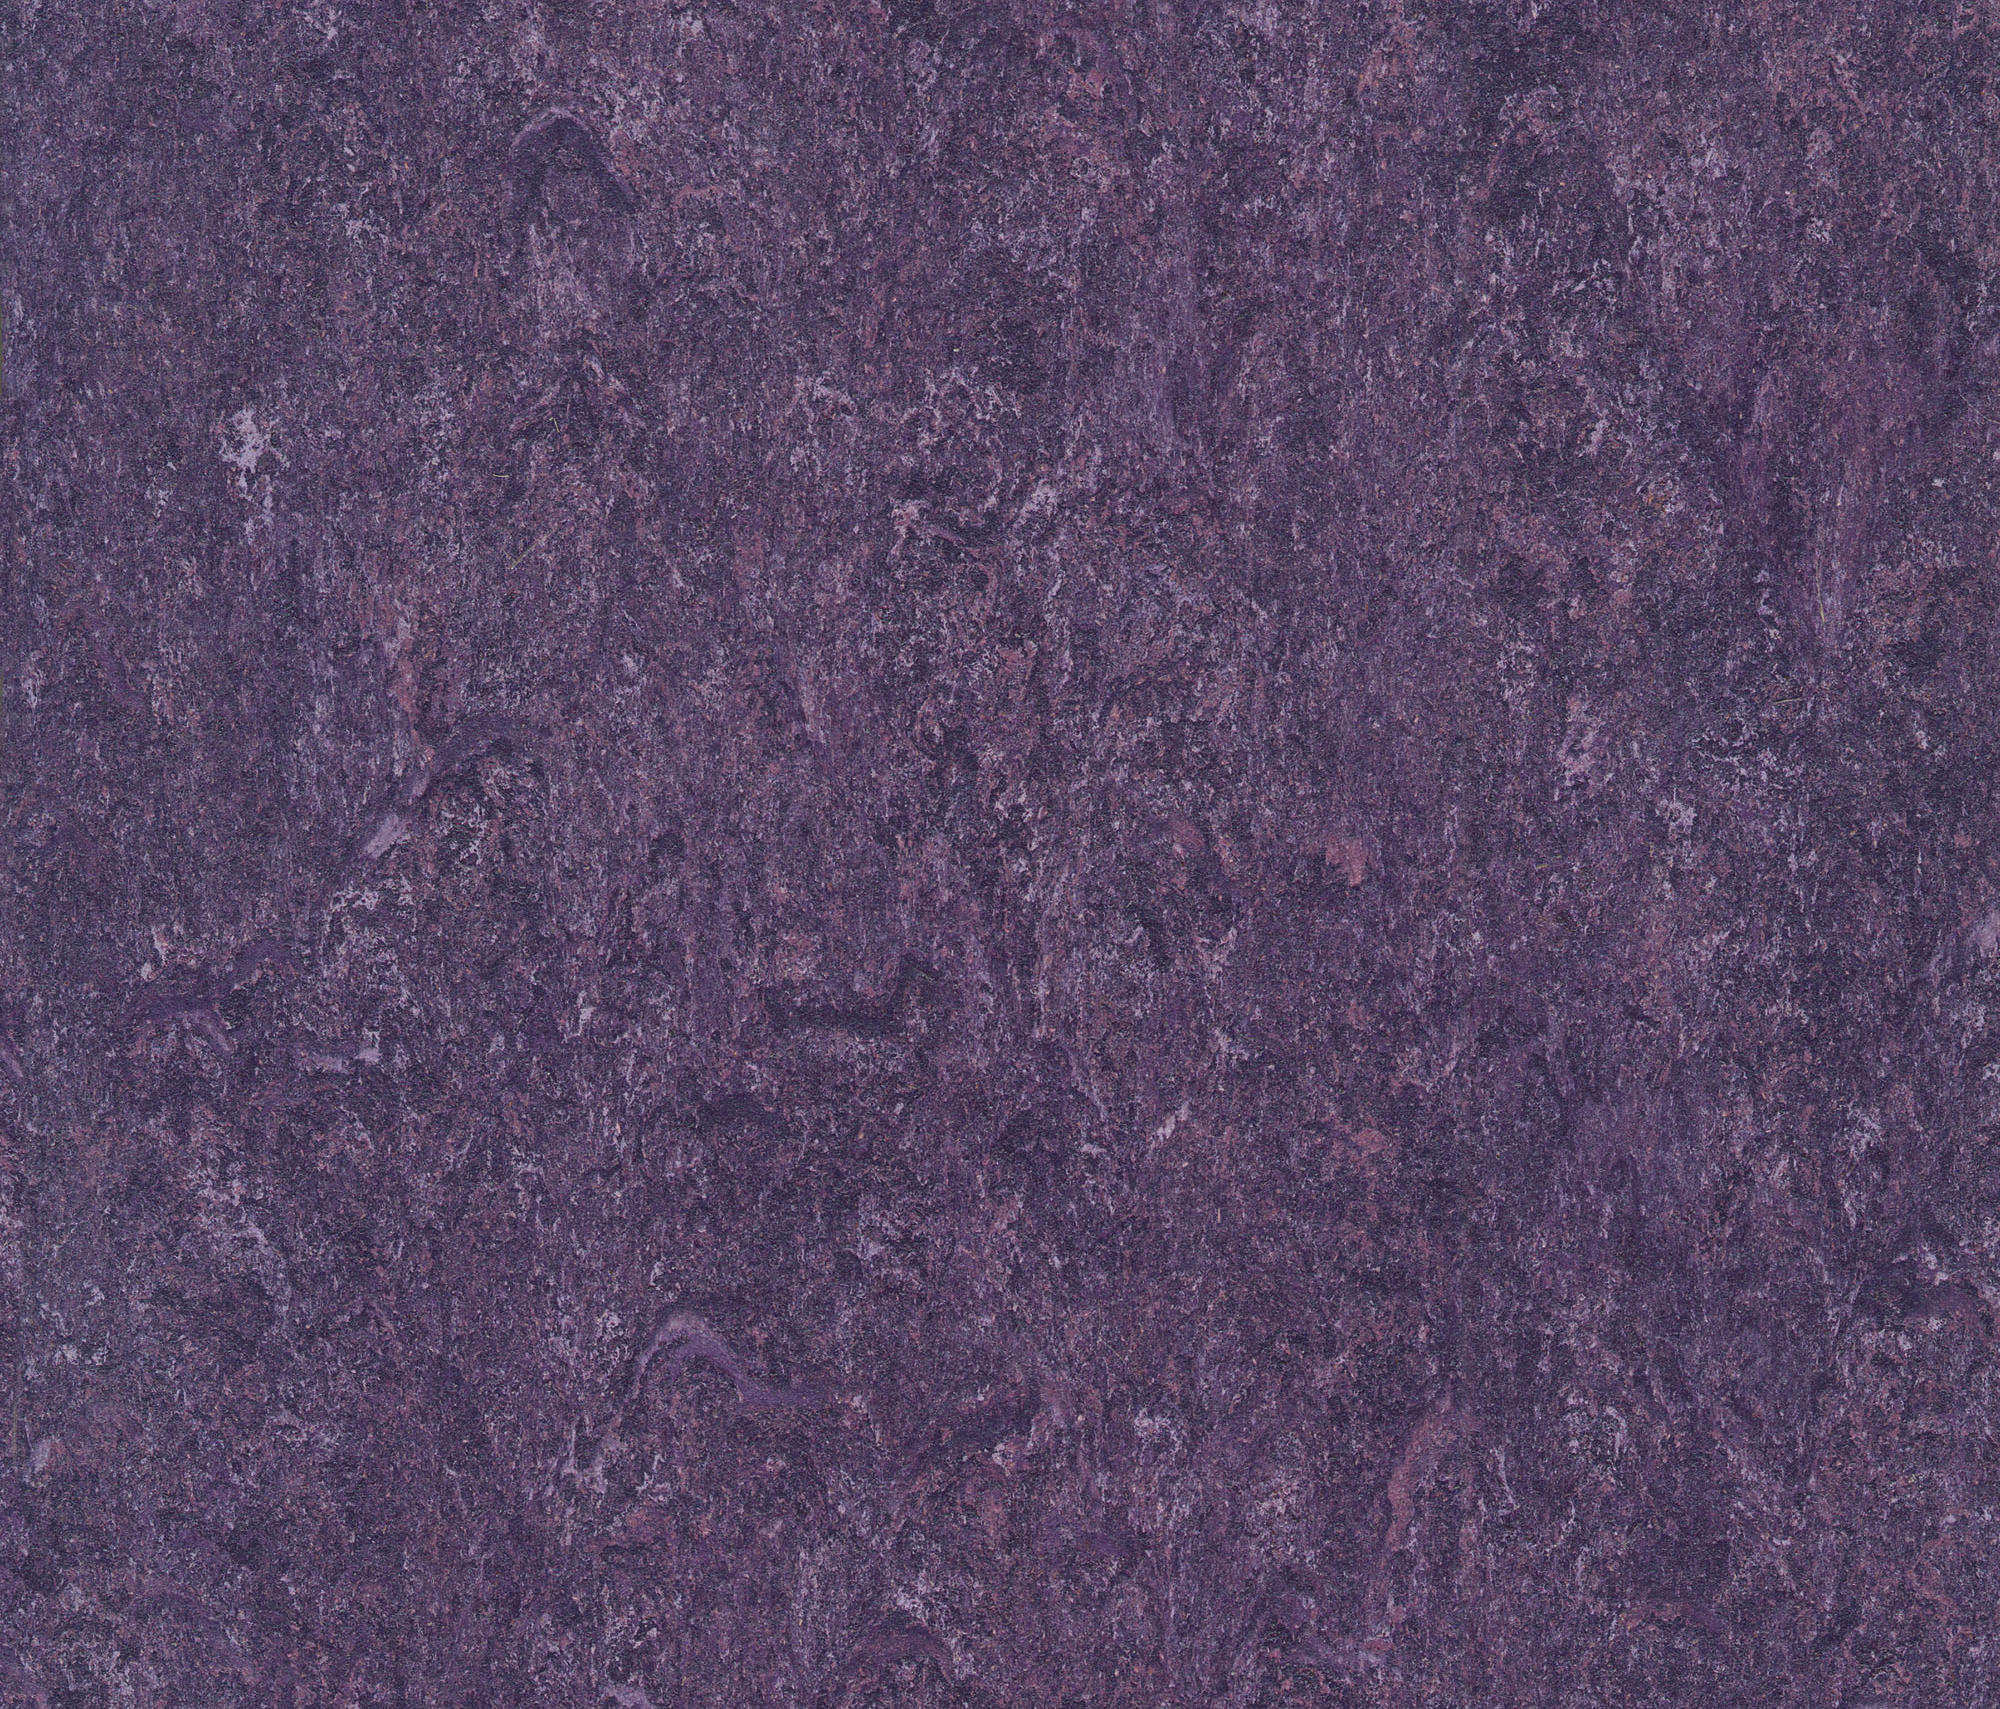 marmorette pur 125 128 linoleum flooring from armstrong. Black Bedroom Furniture Sets. Home Design Ideas